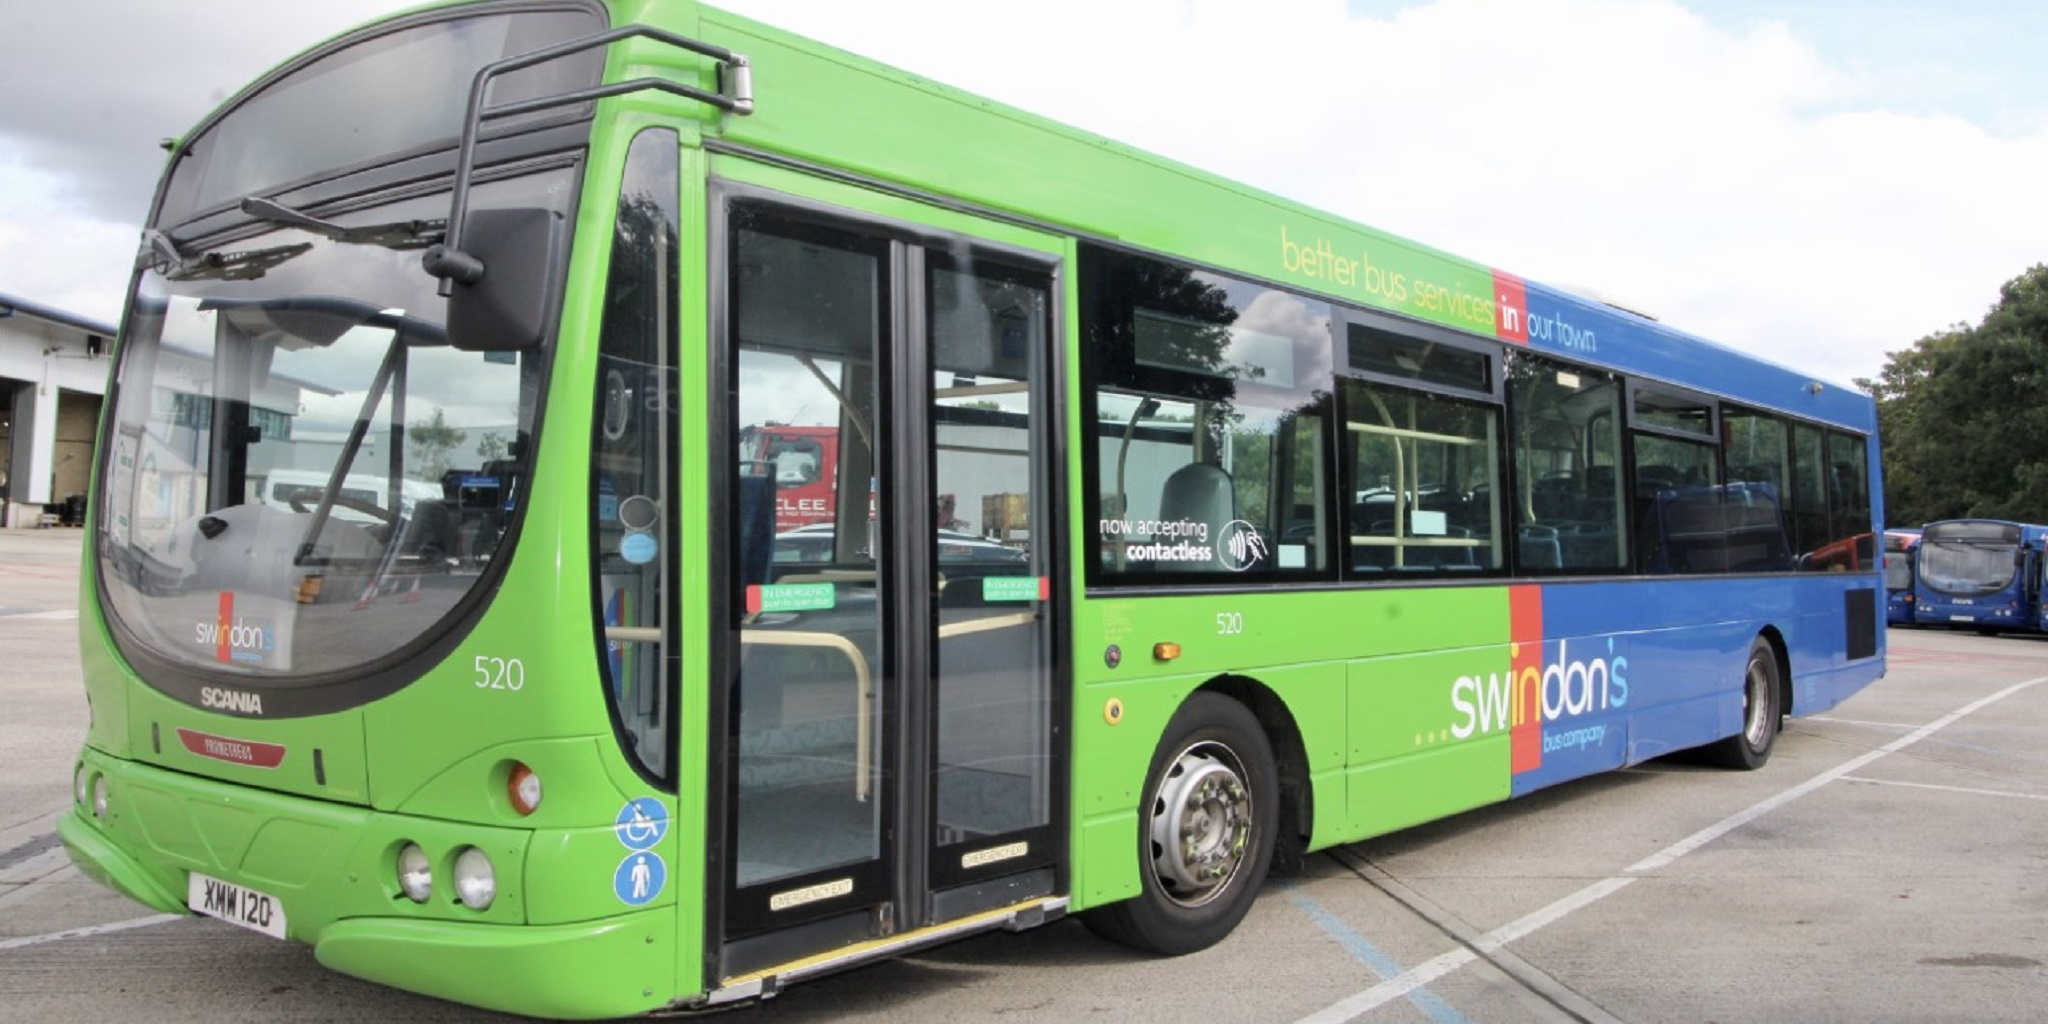 Swindon's Bus Company fuel crisis